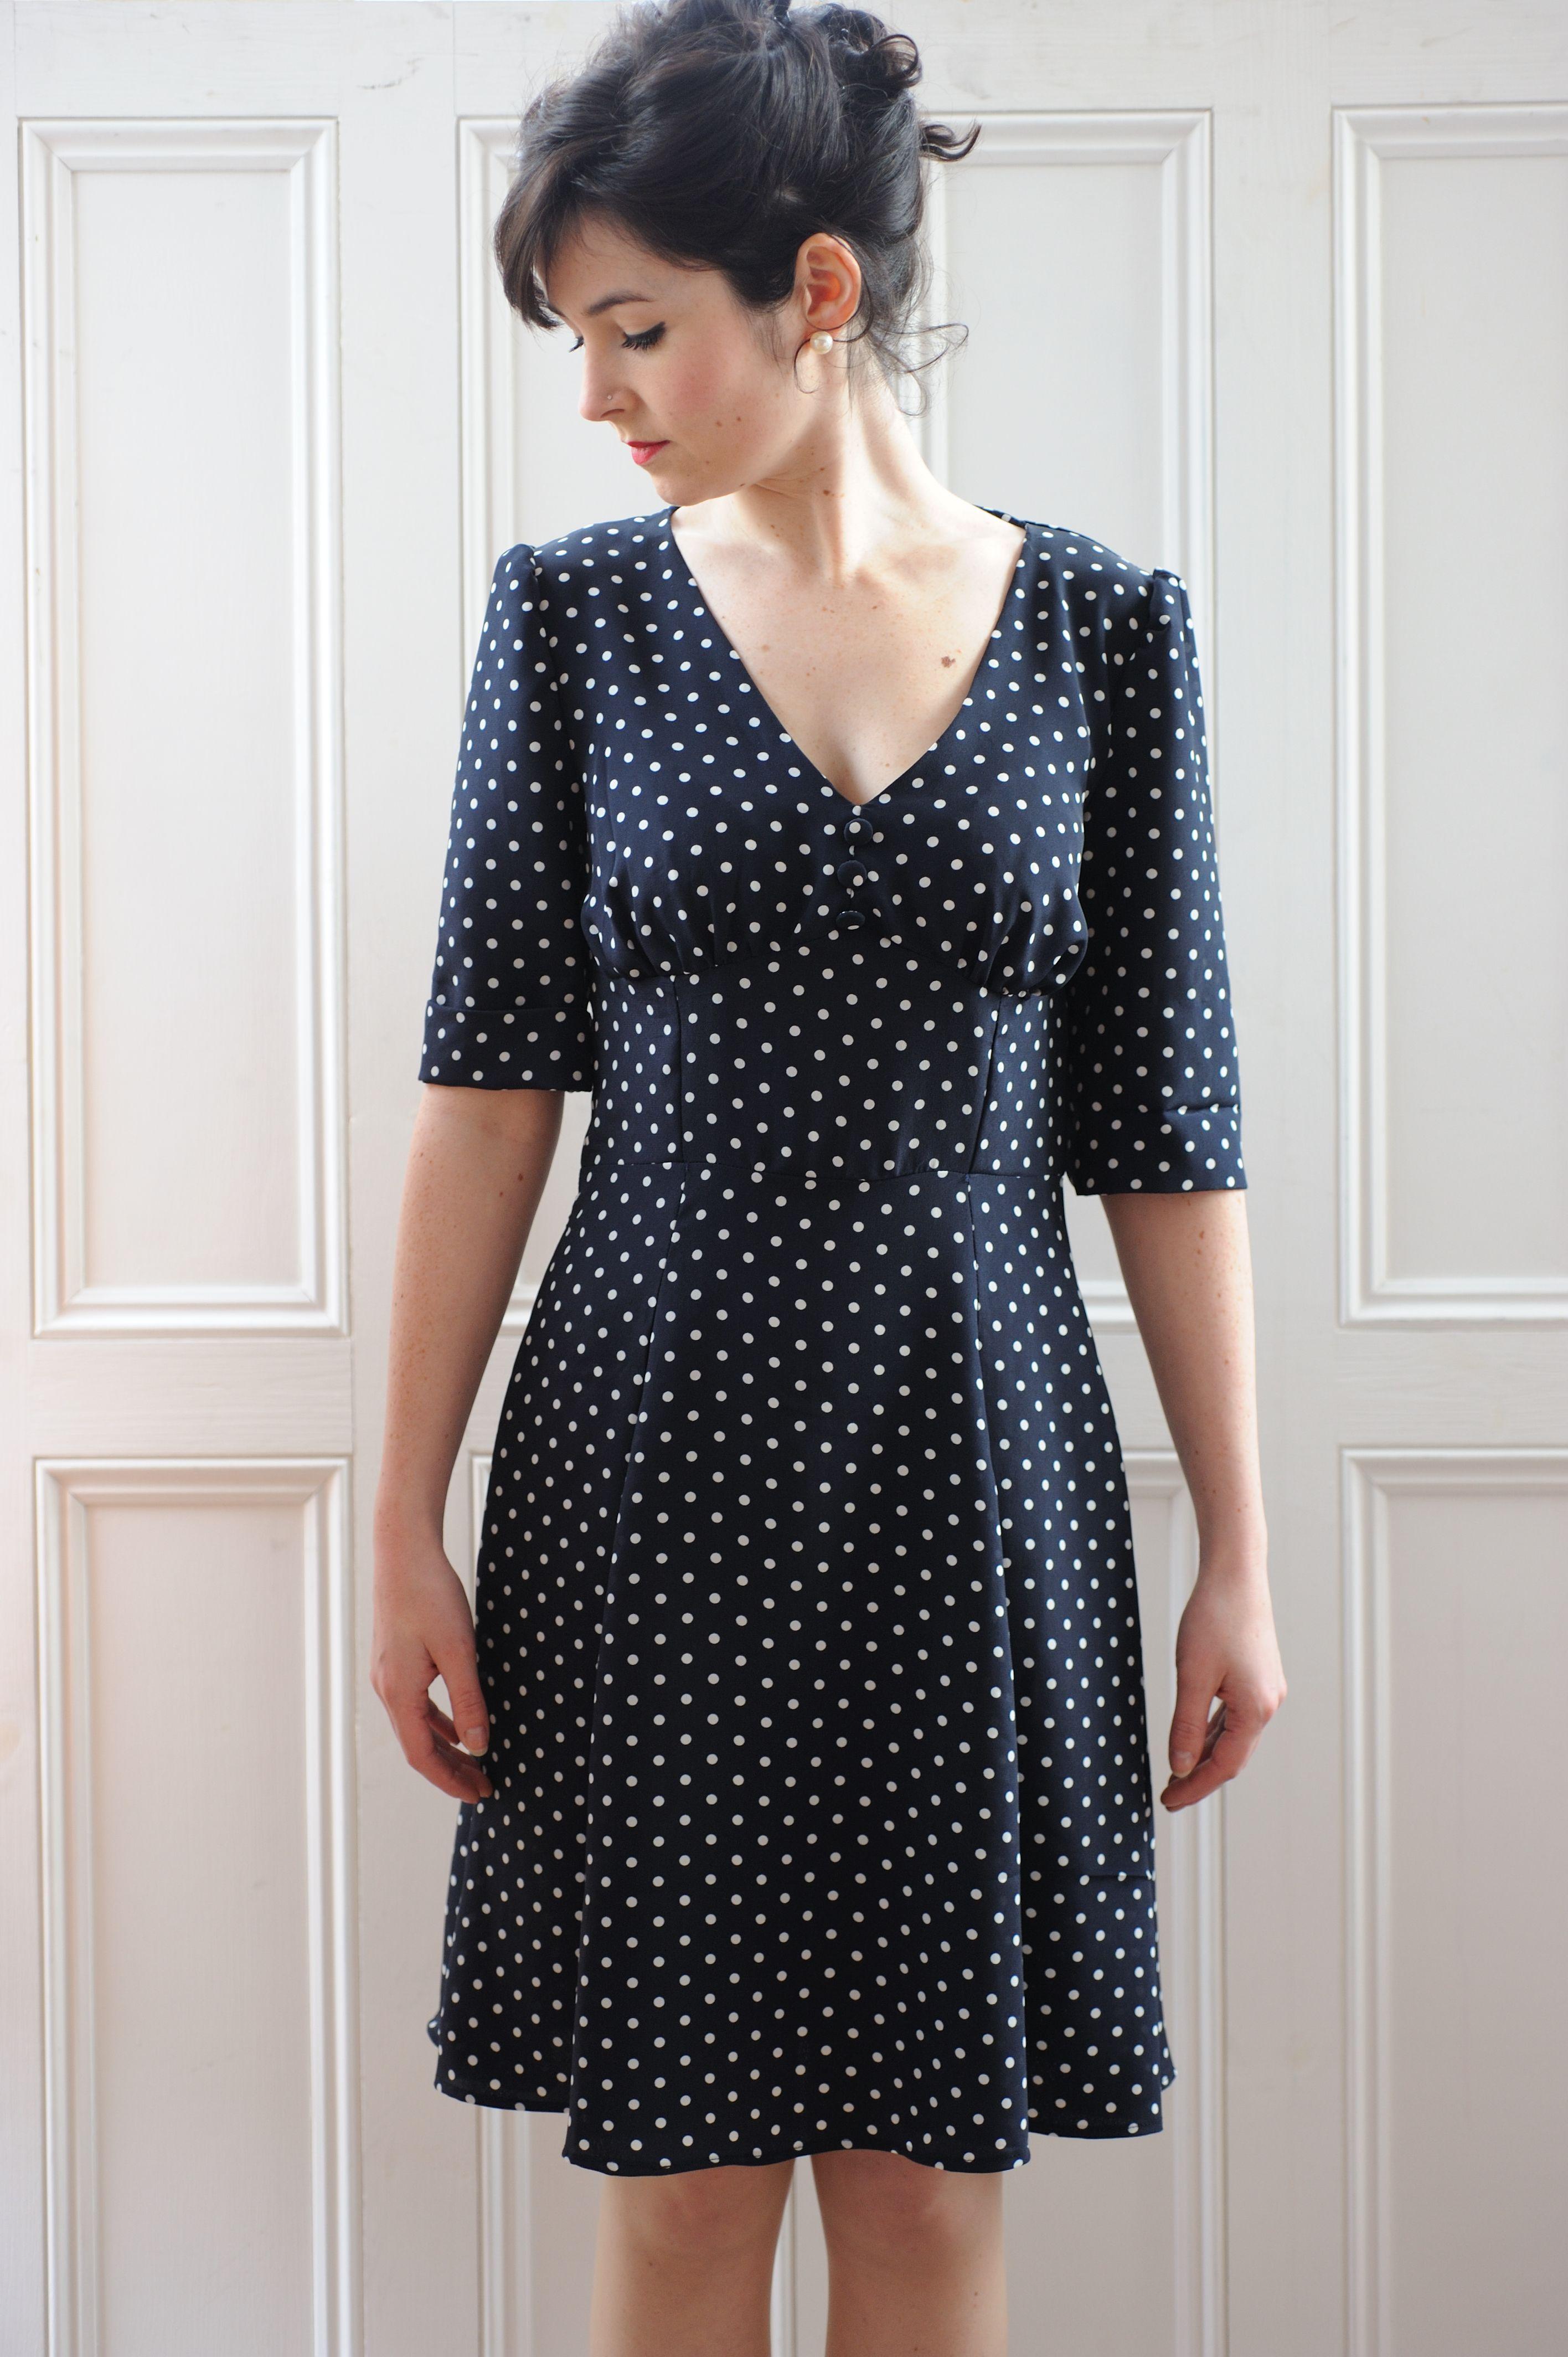 1940\'s Tea Dress Sewing Pattern | Nähen, Schnittmuster und Erwachsene